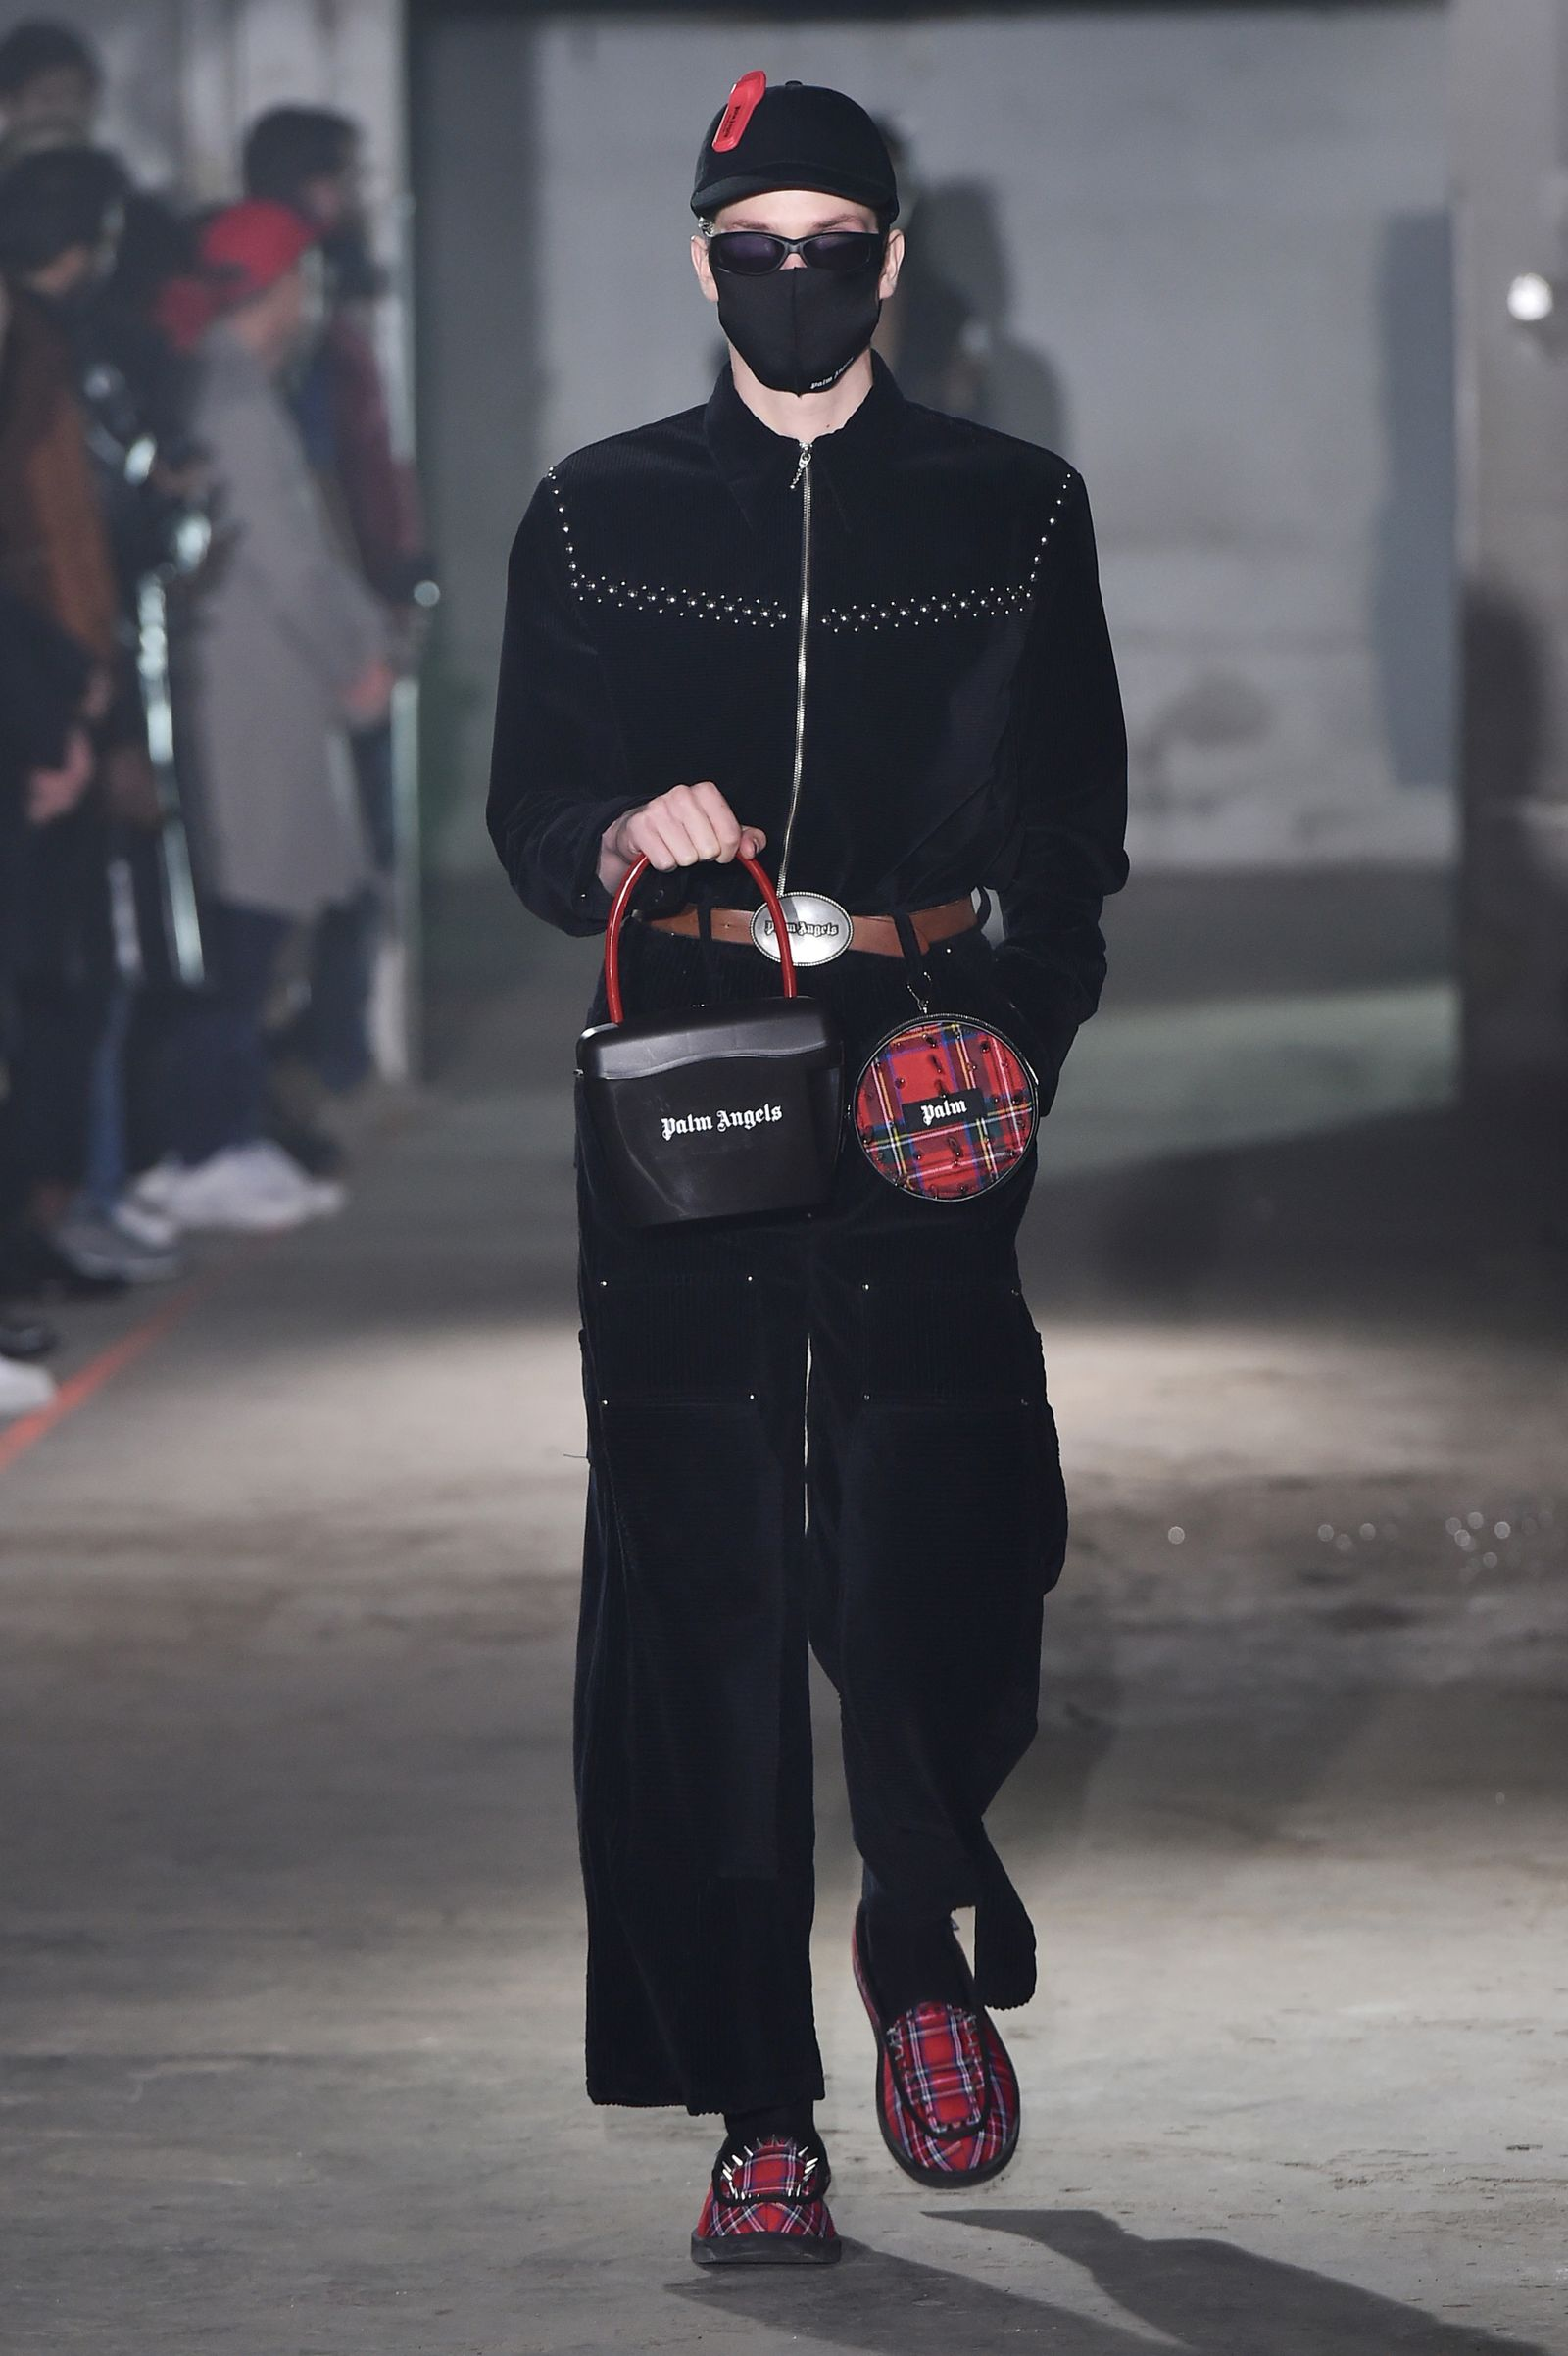 Palm Angels - Mens Fall 2018 Runway - Milan Menswear Fashion Week